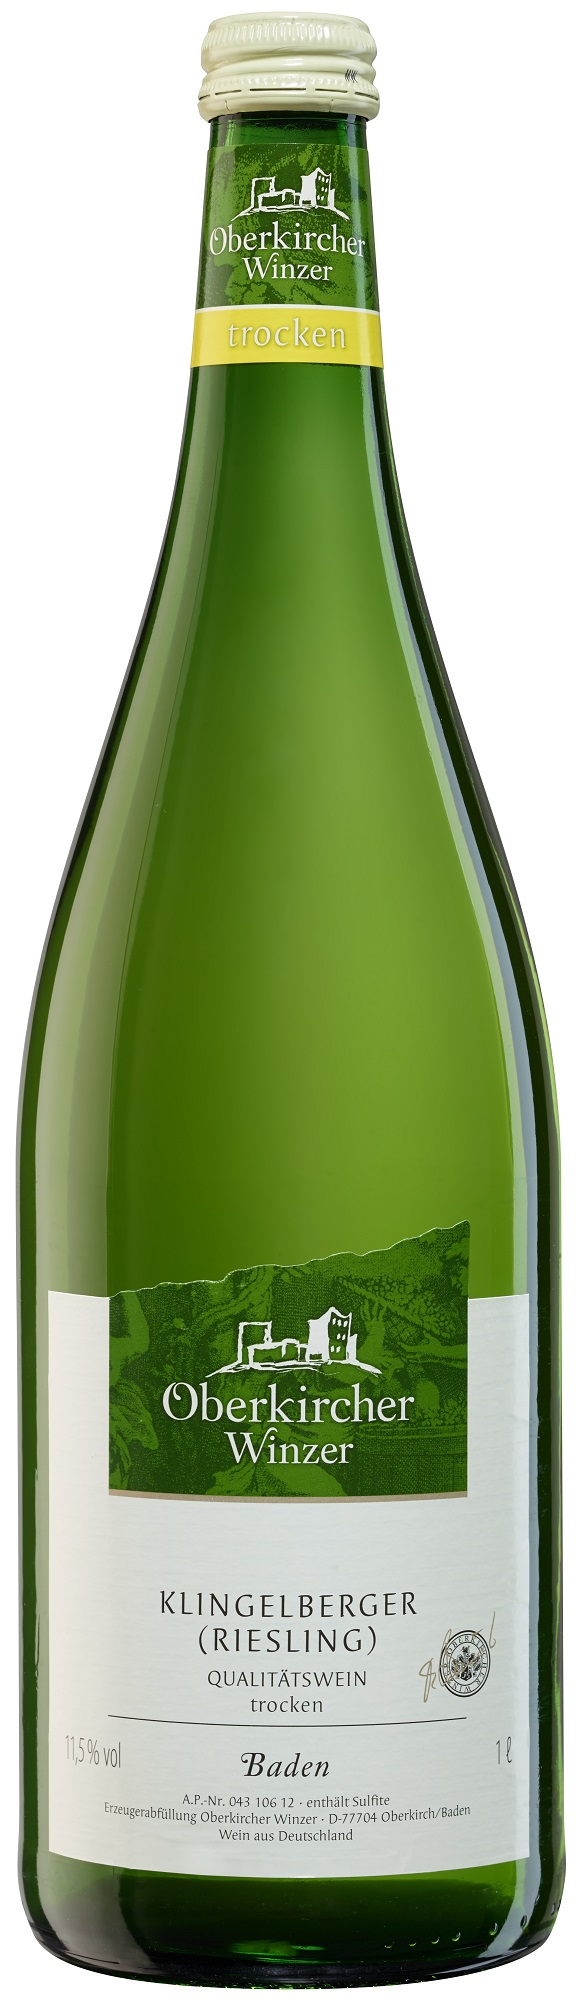 Collection Oberkirch , Riesling Qualitätswein trocken